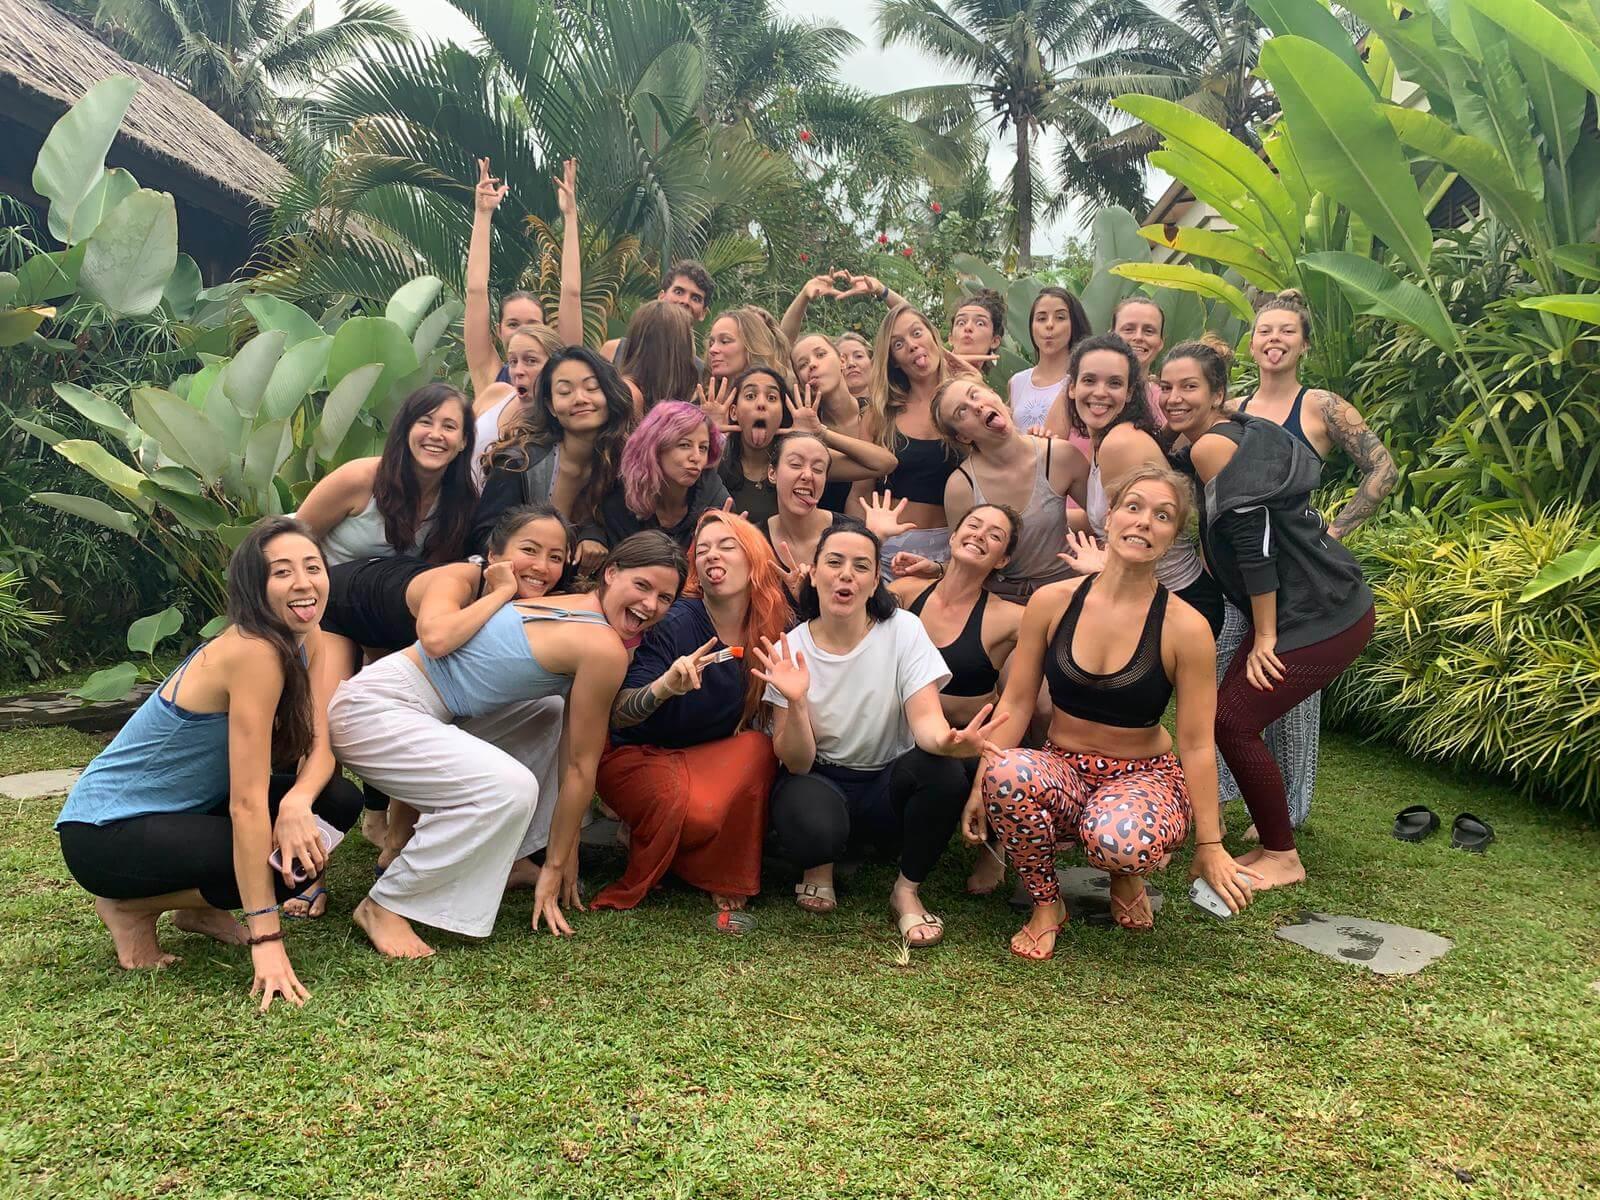 zuna yoga ubud bali yoga teacher training retreat 200hr ytt